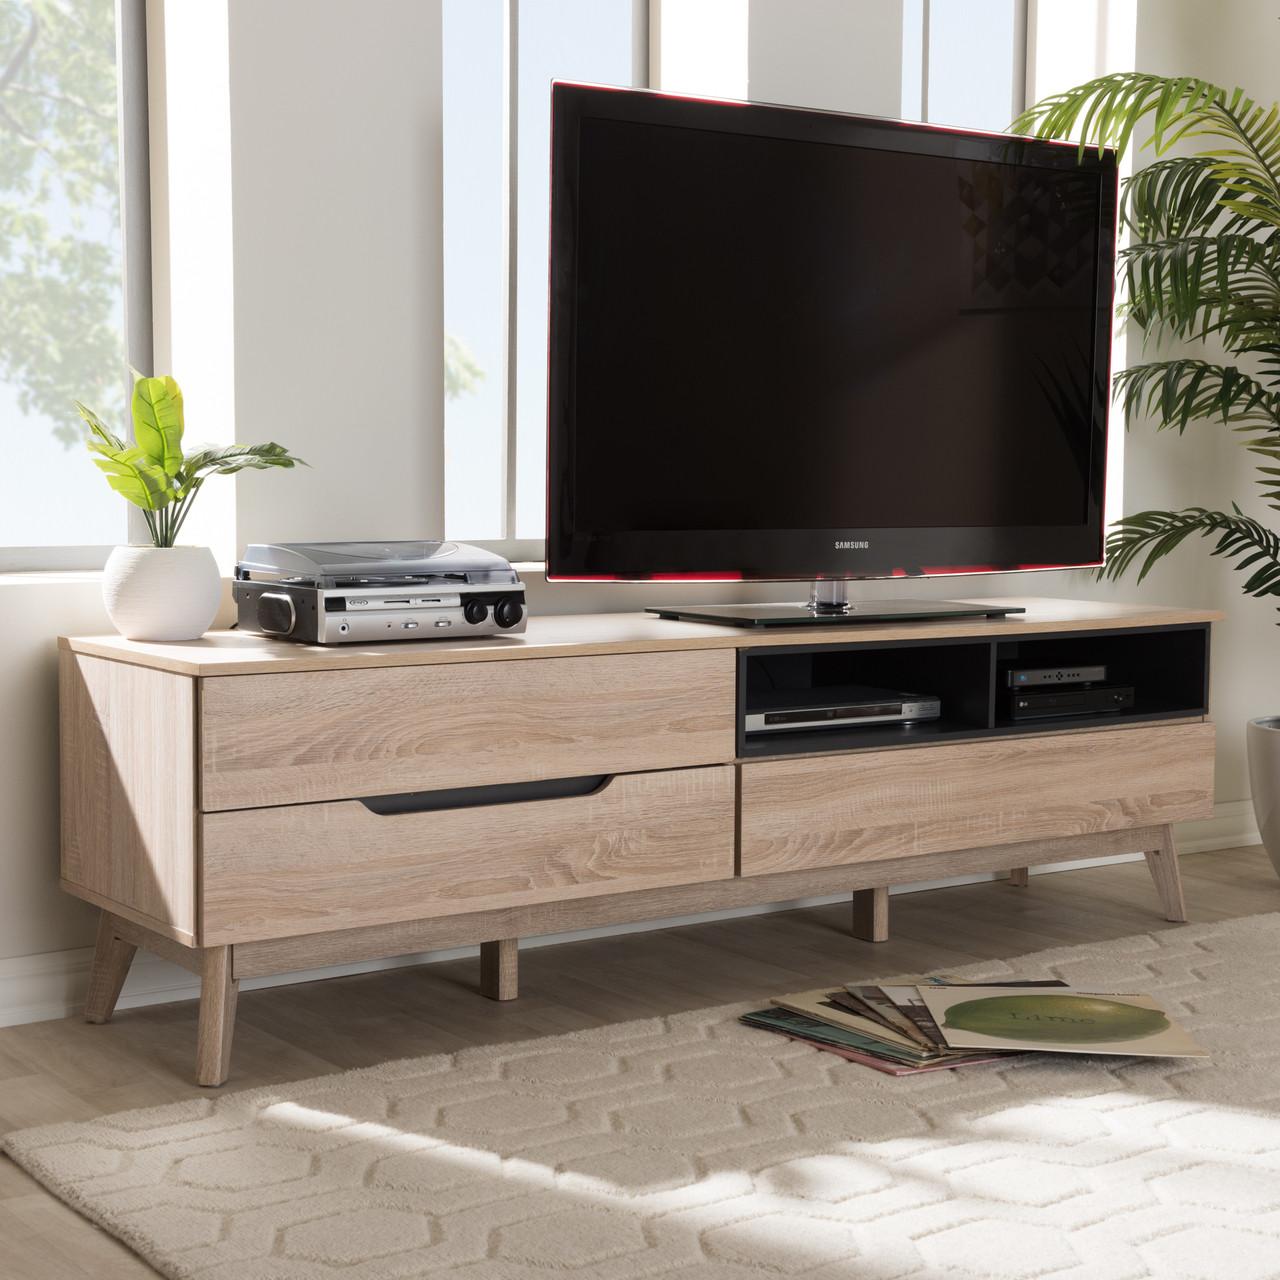 Baxton Studio Fella Mid Century Modern Two Tone Oak And Grey Wood Tv